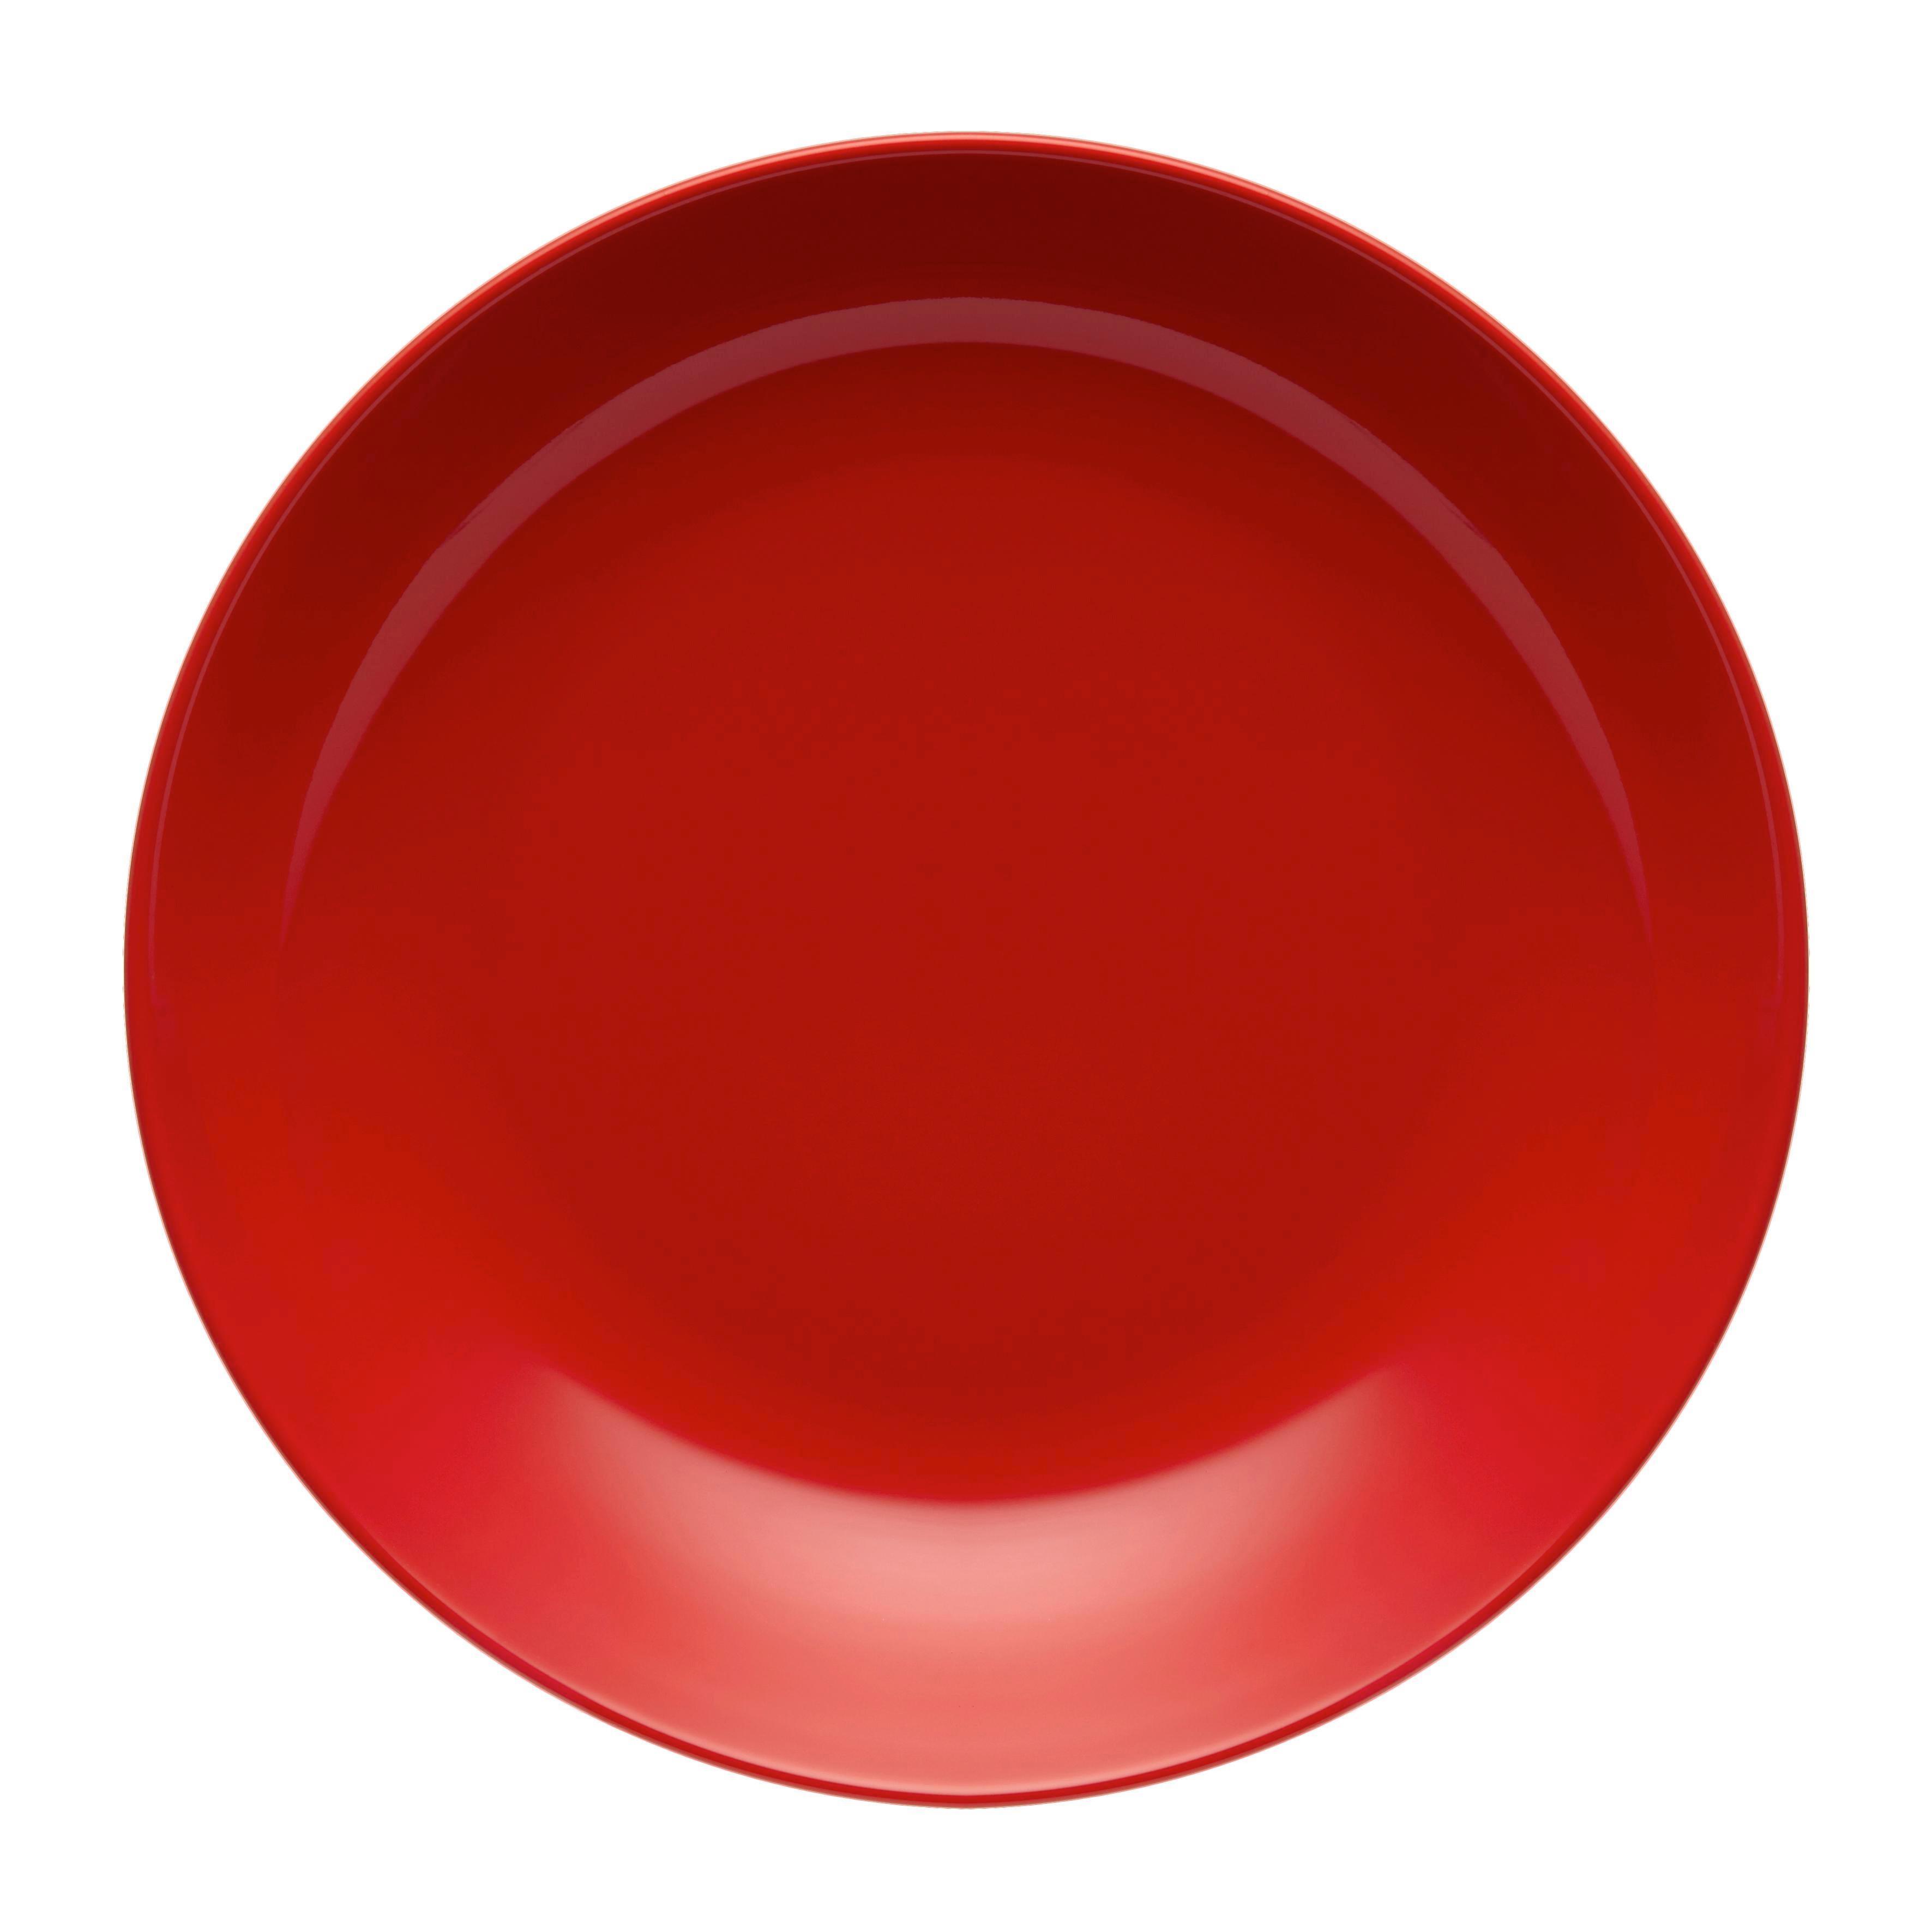 Globoki Krožnik Sandy - rdeča, Konvencionalno, keramika (20/3,5cm) - MÖMAX modern living